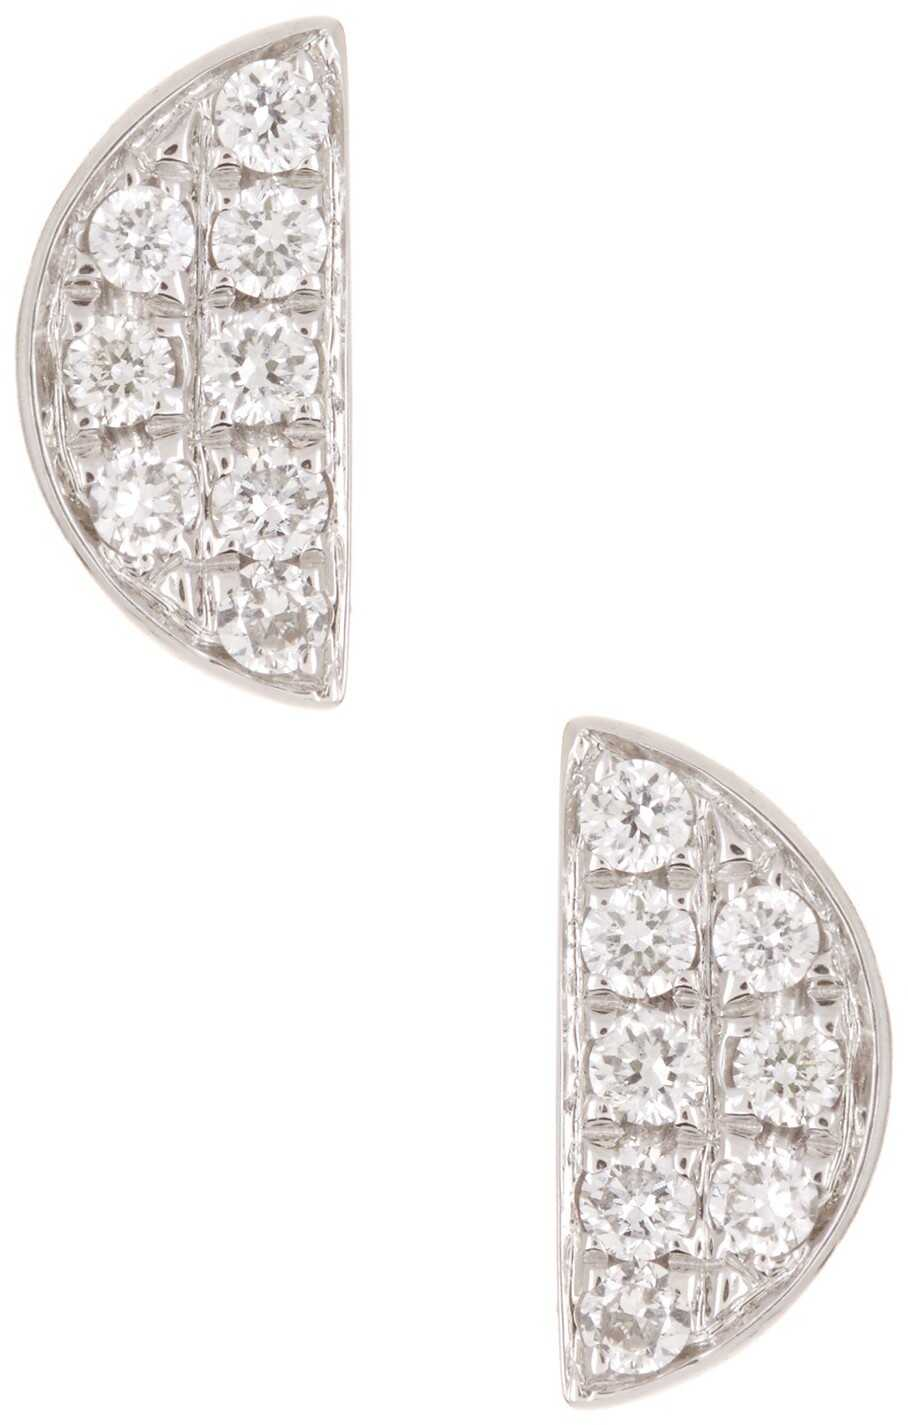 Bony Levy 18K White Gold Pave Diamond Half Moon Earrings - 0.07 ctw 18KWG